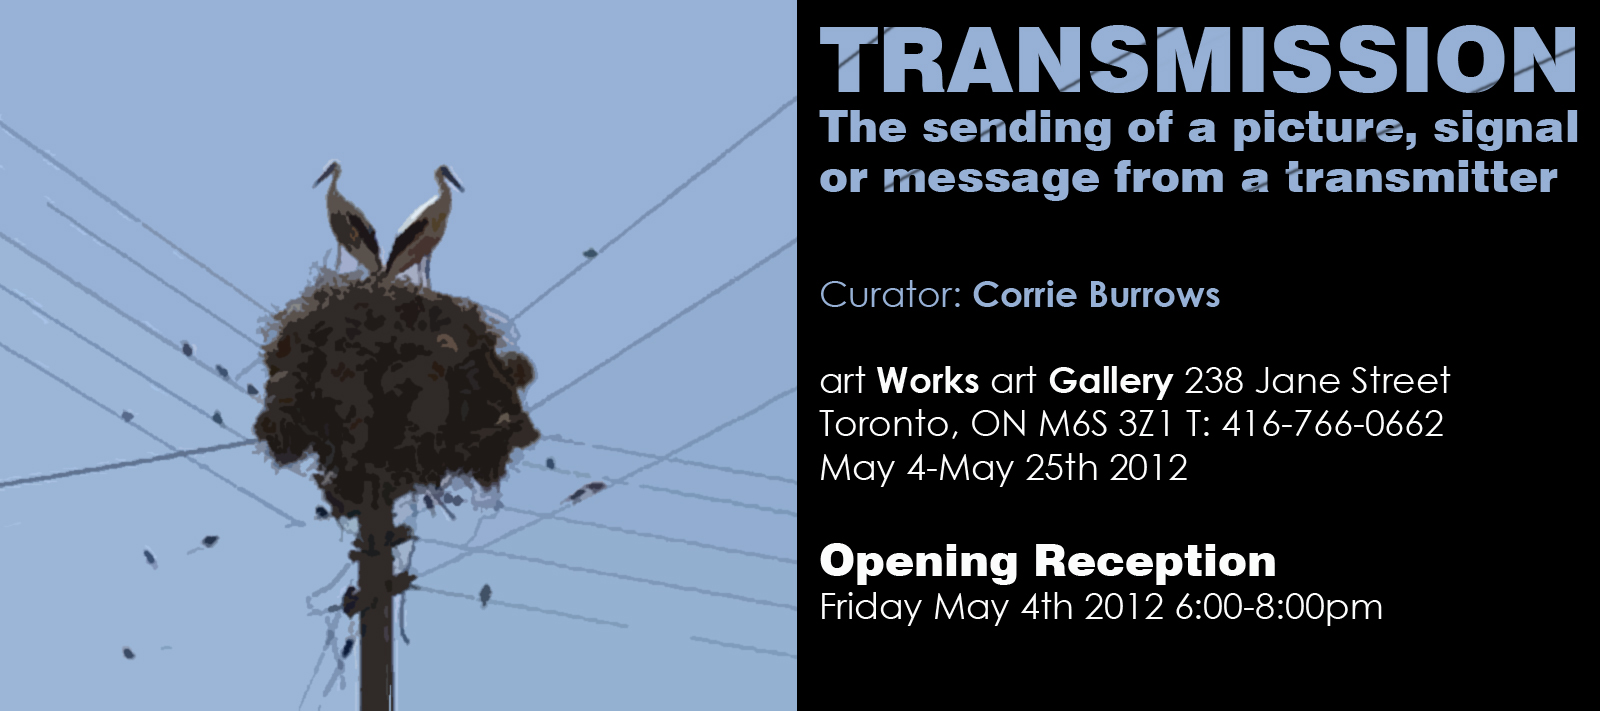 transmissions invite 2012 final1.jpg